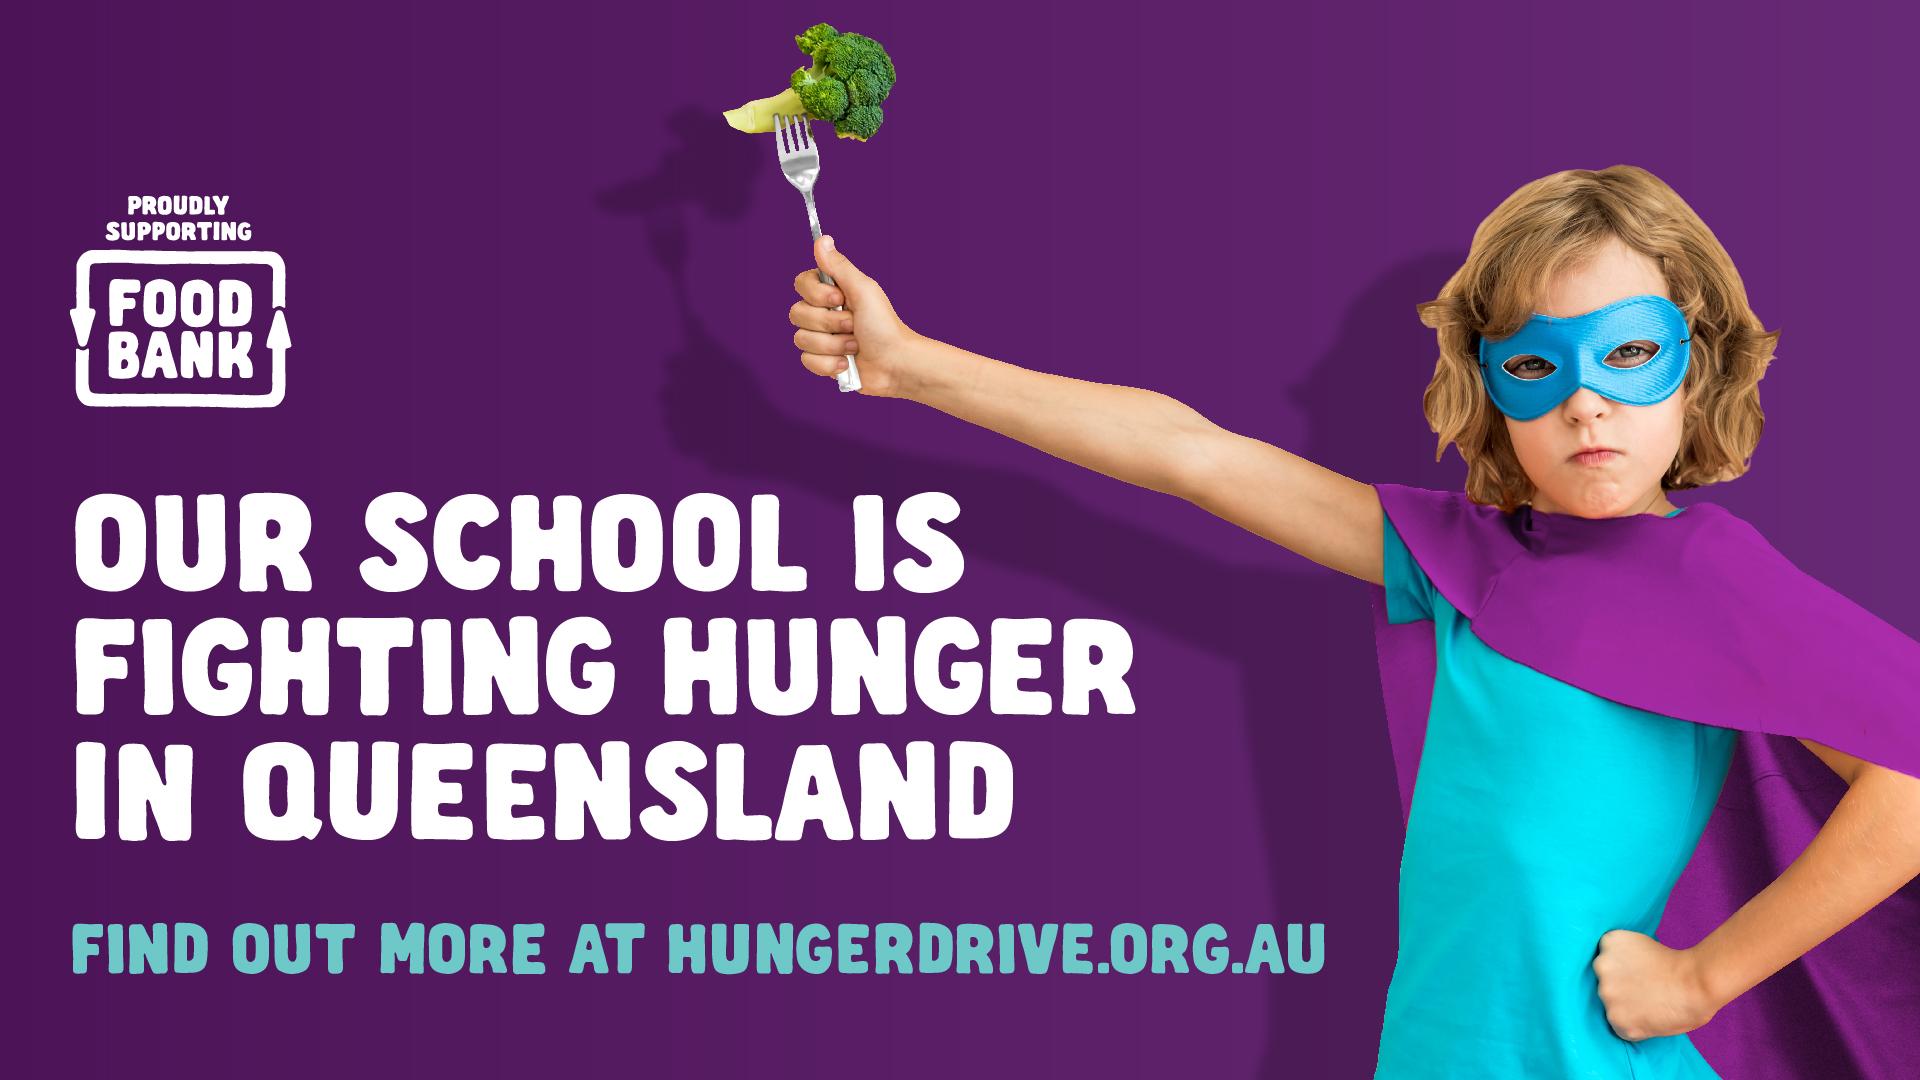 School - Hunger Fighter - Facebook Event